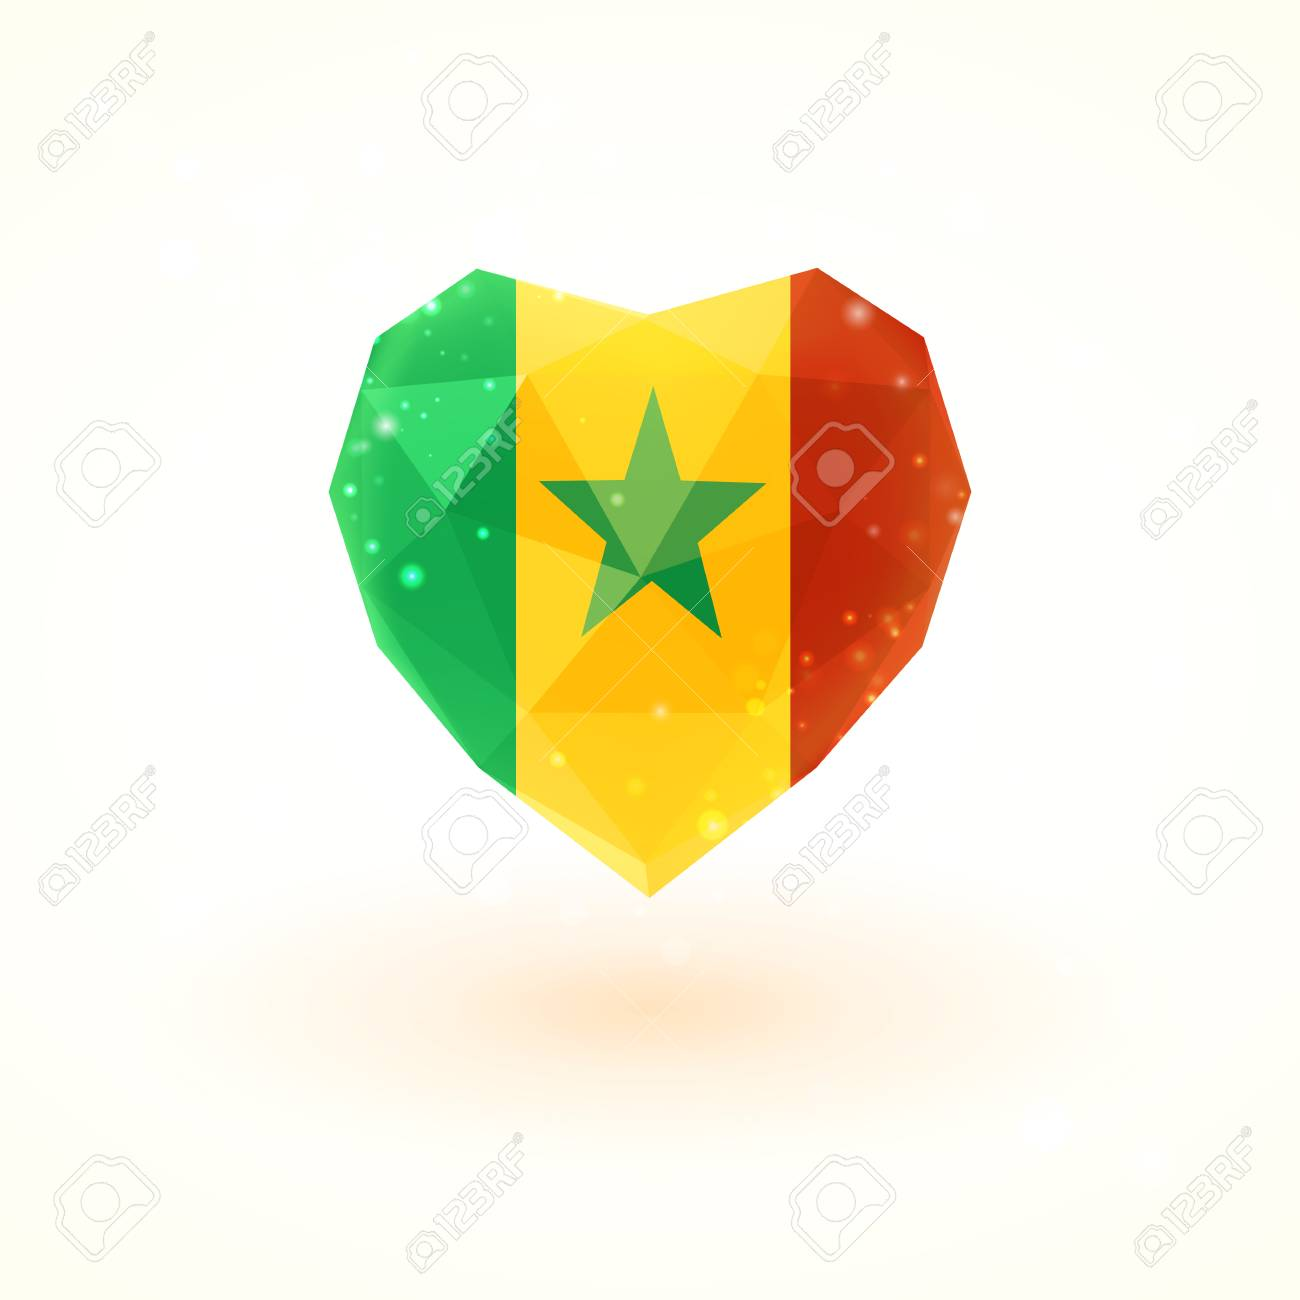 Flag of senegal in shape of diamond glass heart in triangulation flag of senegal in shape of diamond glass heart in triangulation style for info graphics m4hsunfo